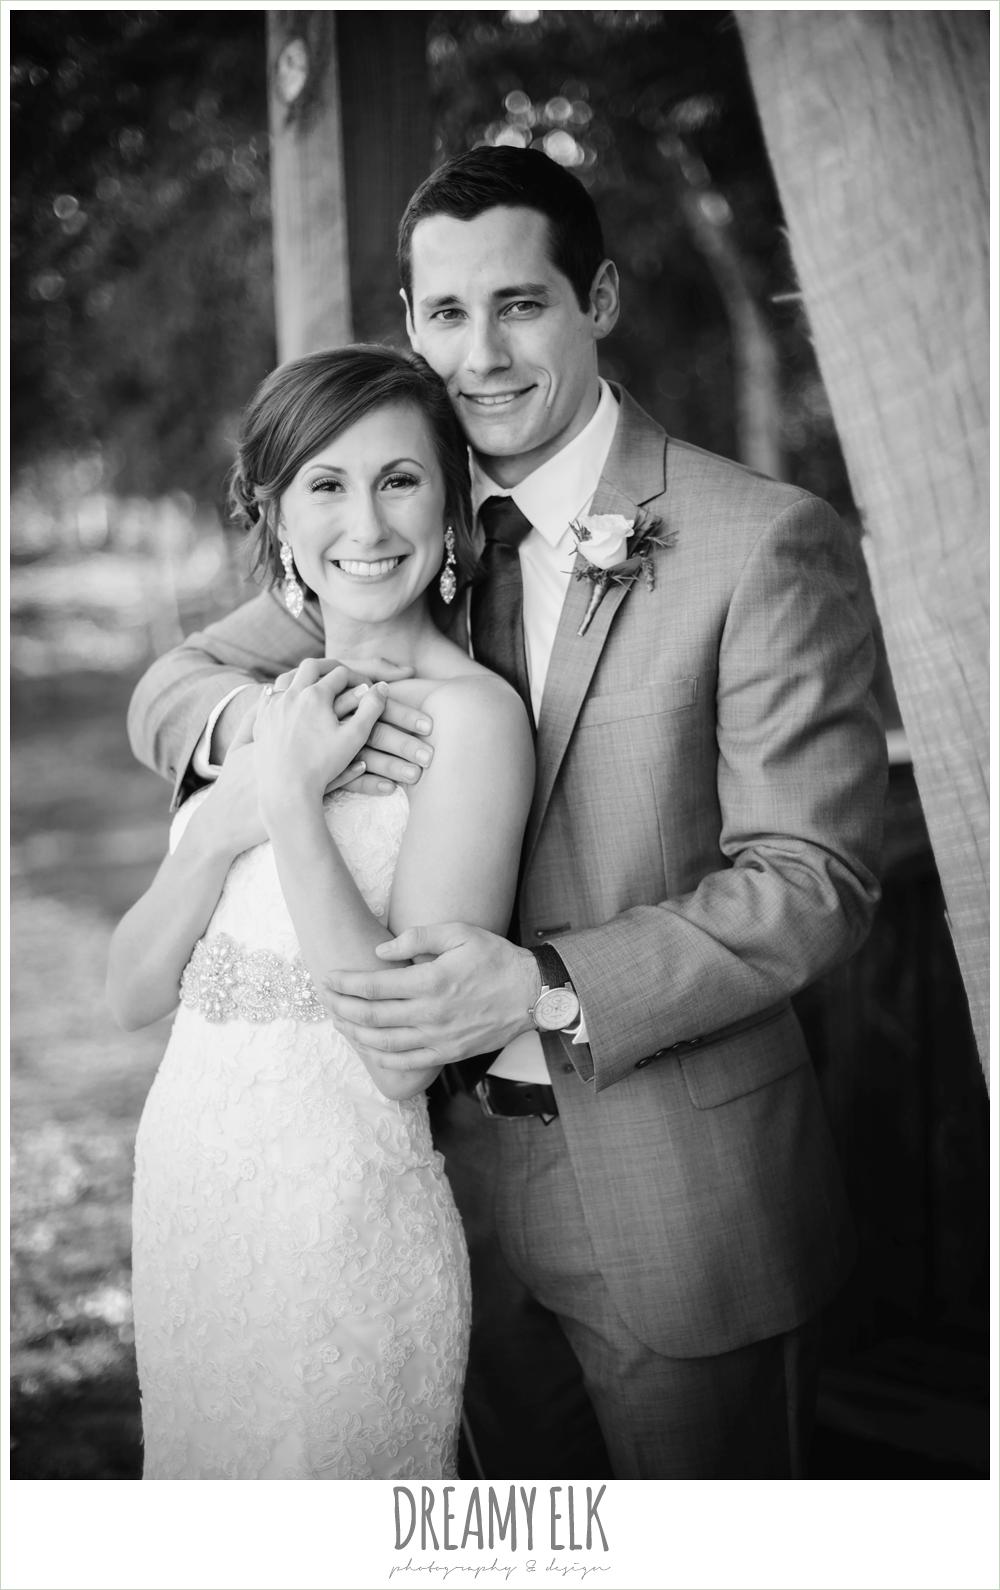 lace sweetheart mermaid wedding dress, rustic chic, spring wedding photo, big sky barn, montgomery, texas {dreamy elk photography and design}